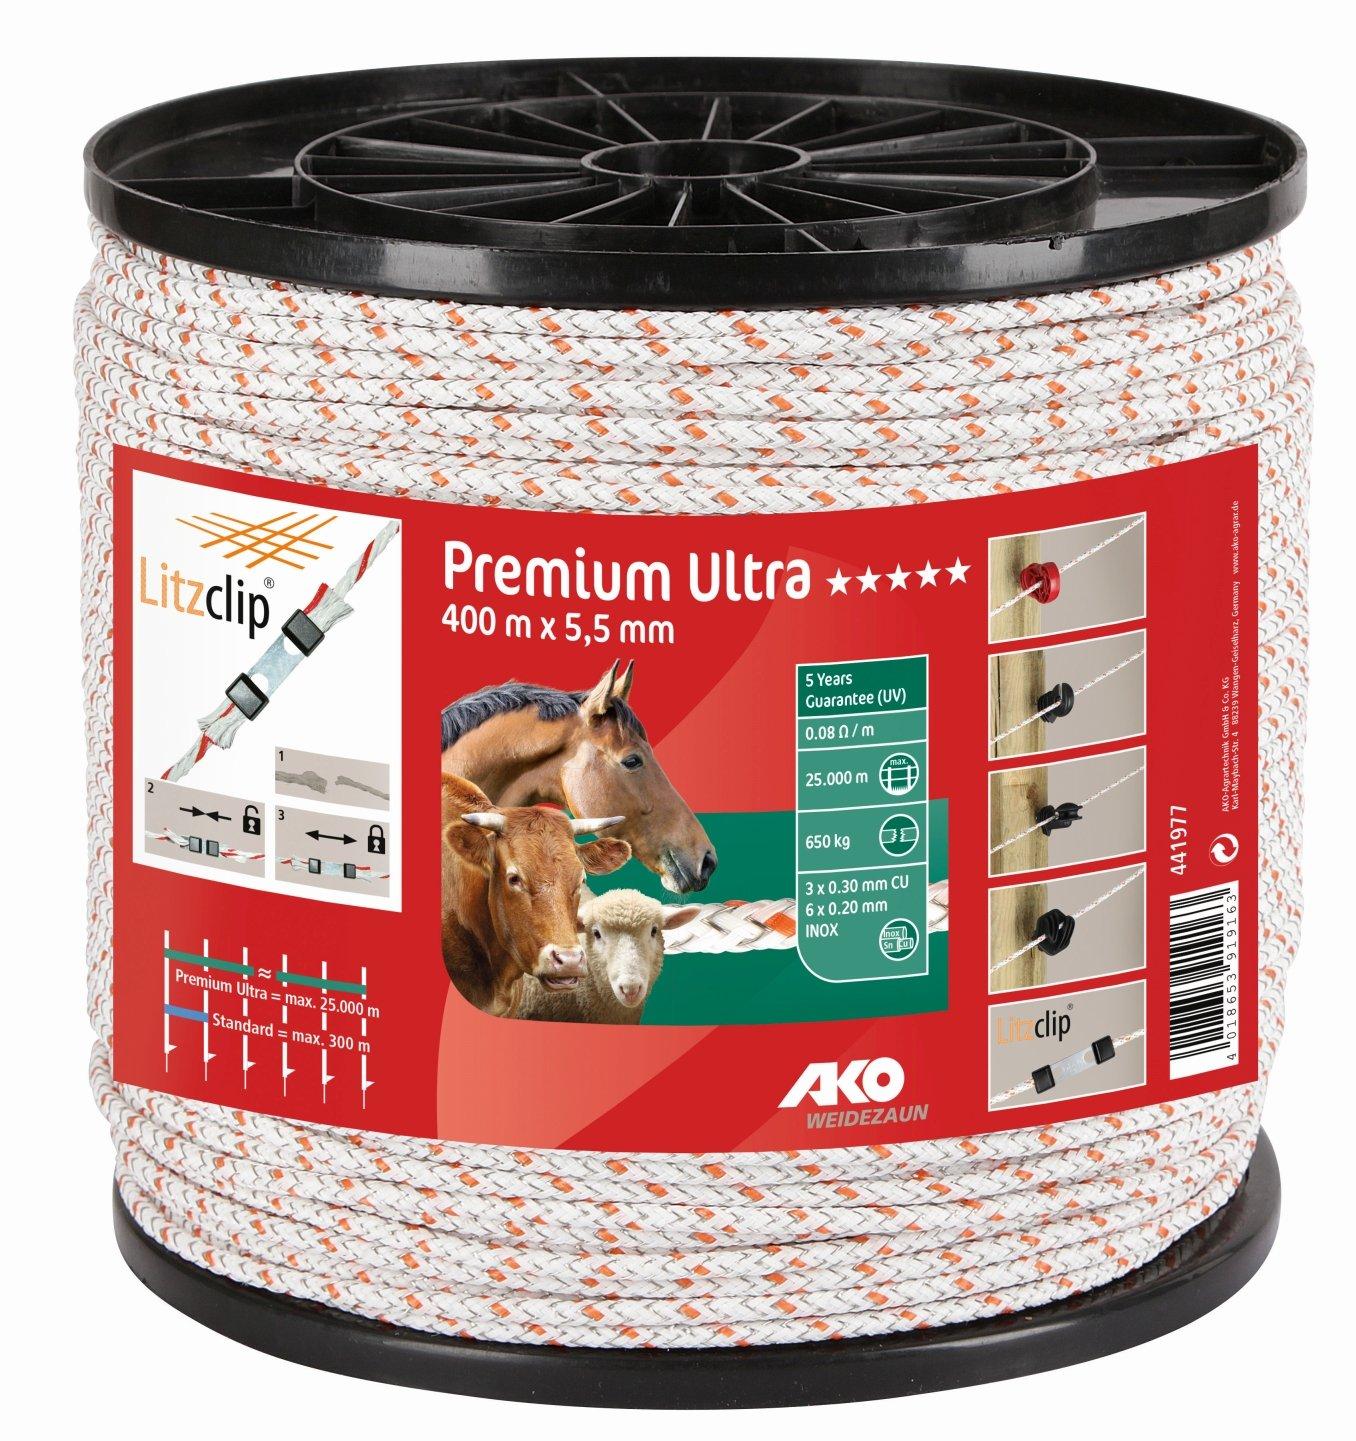 Premium Ultra Seil, 5,5mm,400m weiß/orange 6xniro 0,2+3xCU0,3 k441977